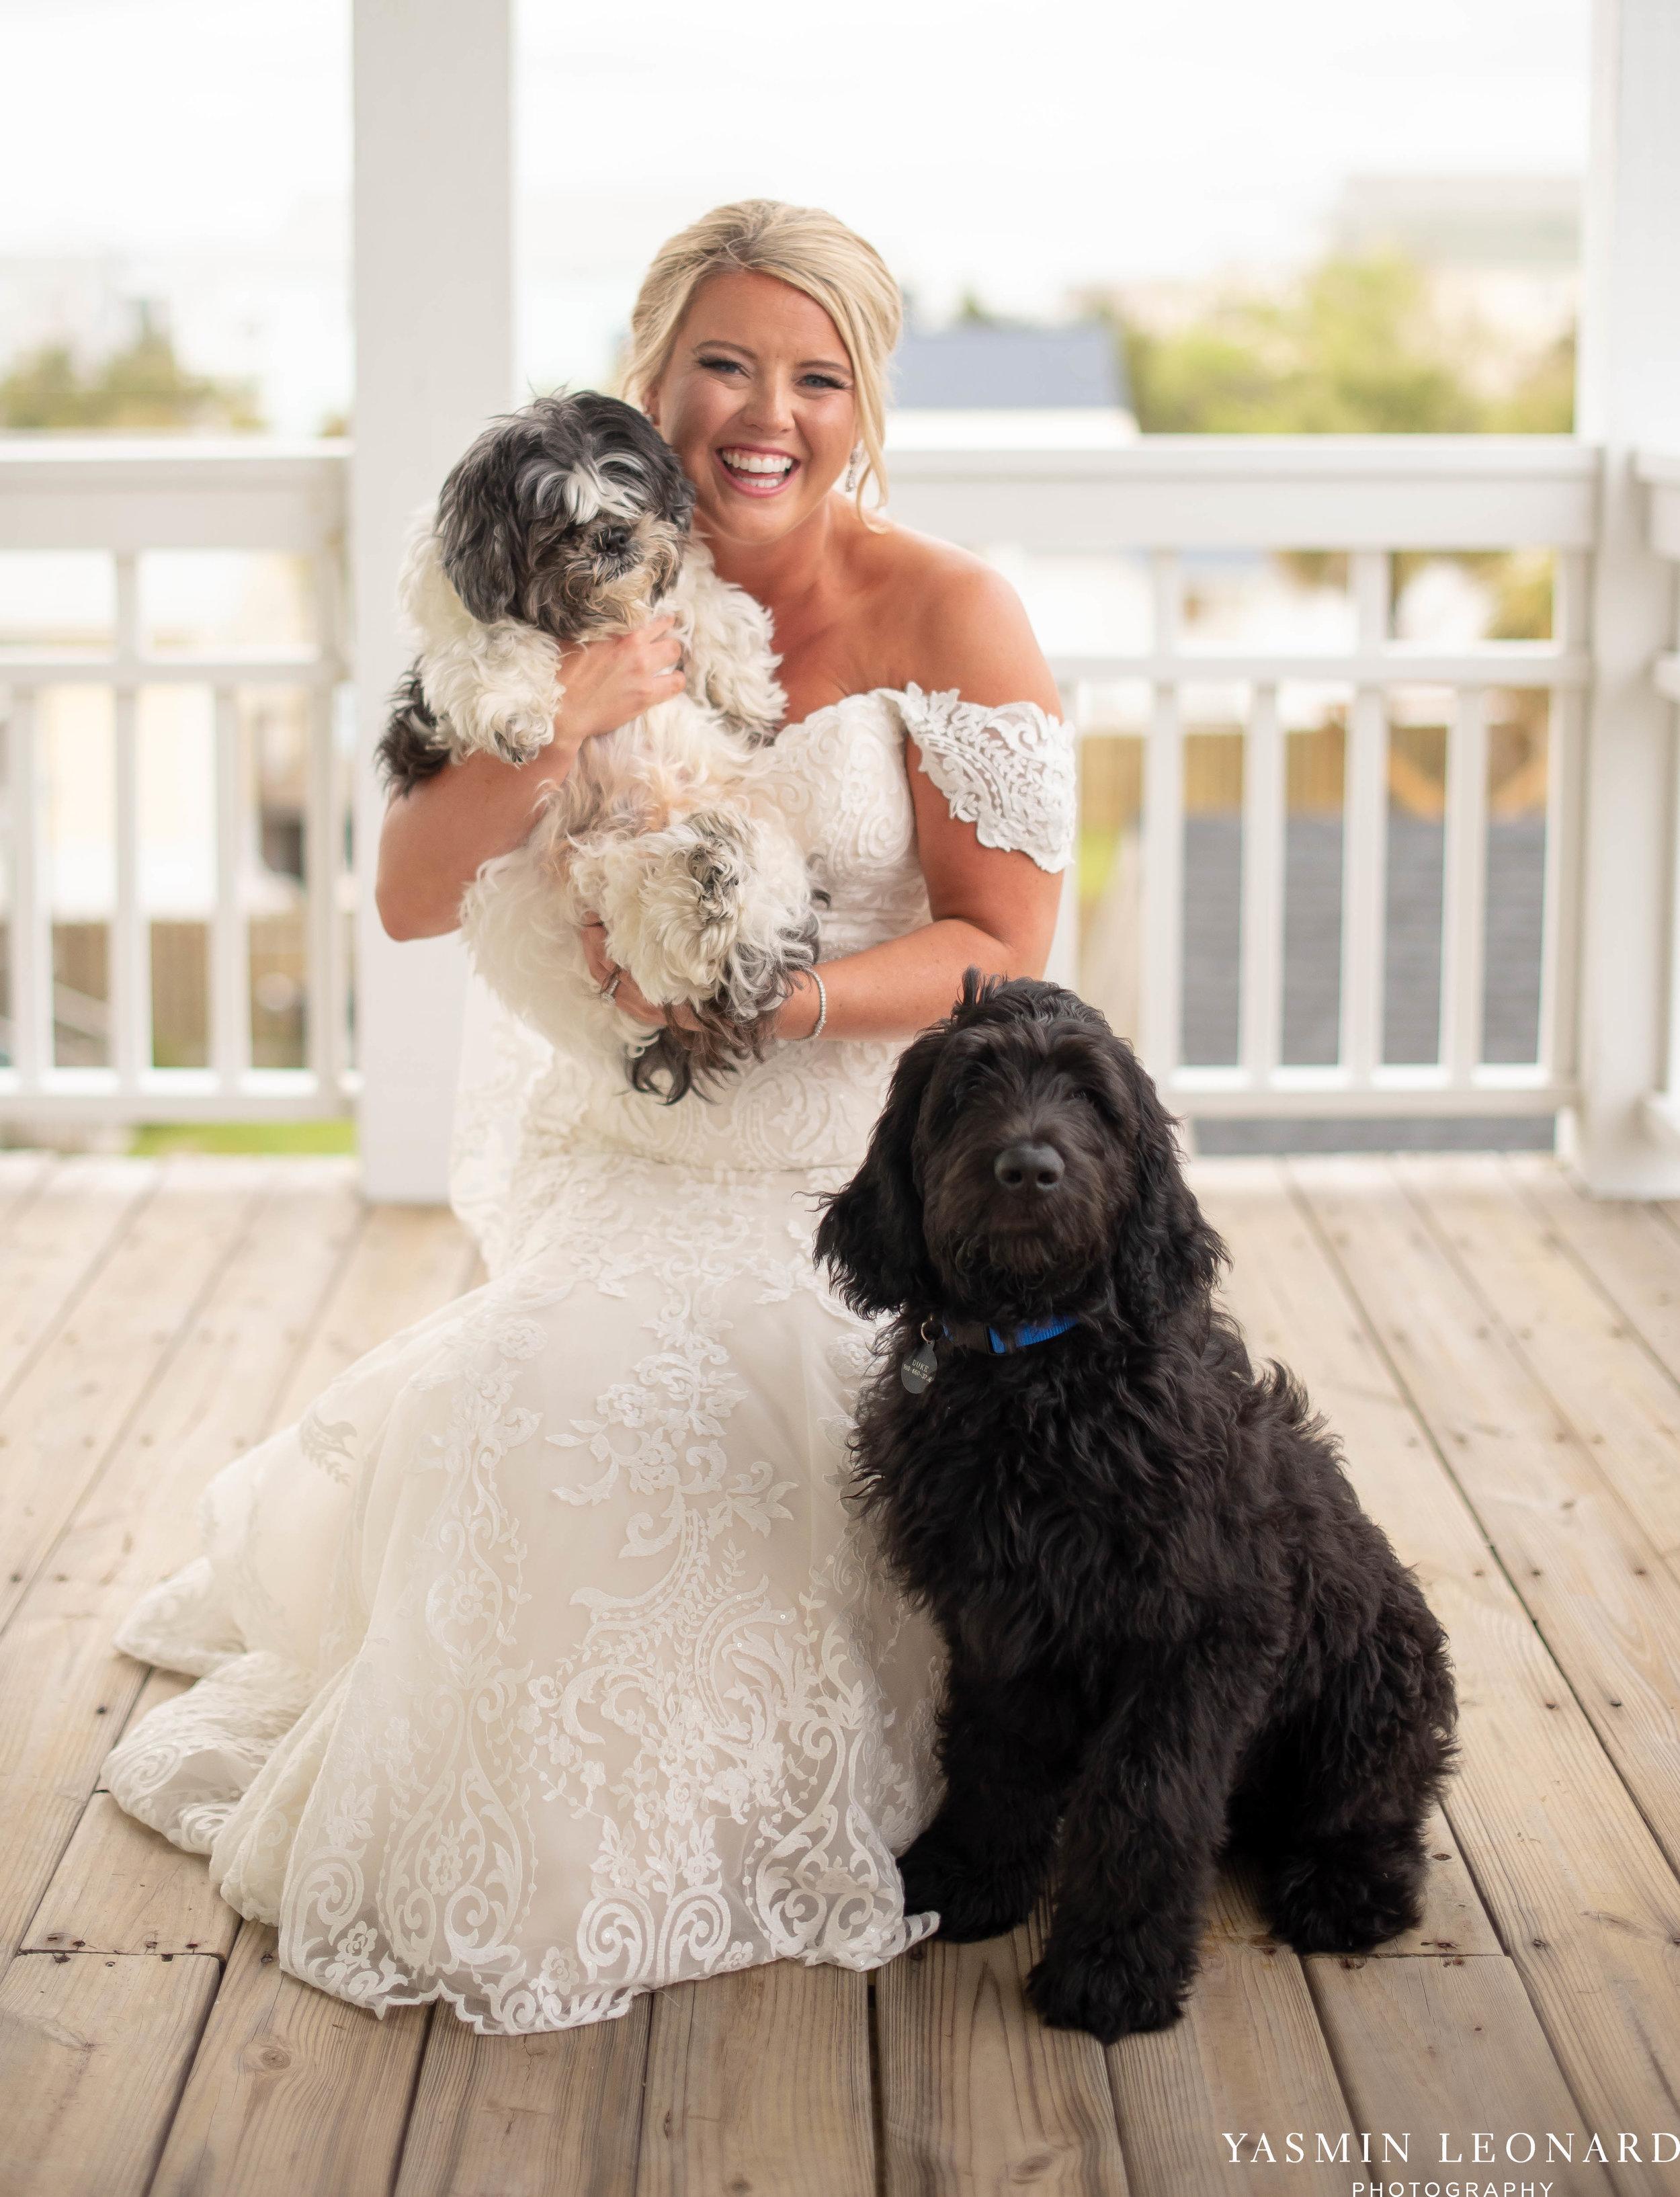 Carolina Beach Wedding - Fort Fisher Wedding - NC Acquarium - Beach Wedding - NC Wedding - Beach Wedding Inspiration - Beach Bride-10.jpg